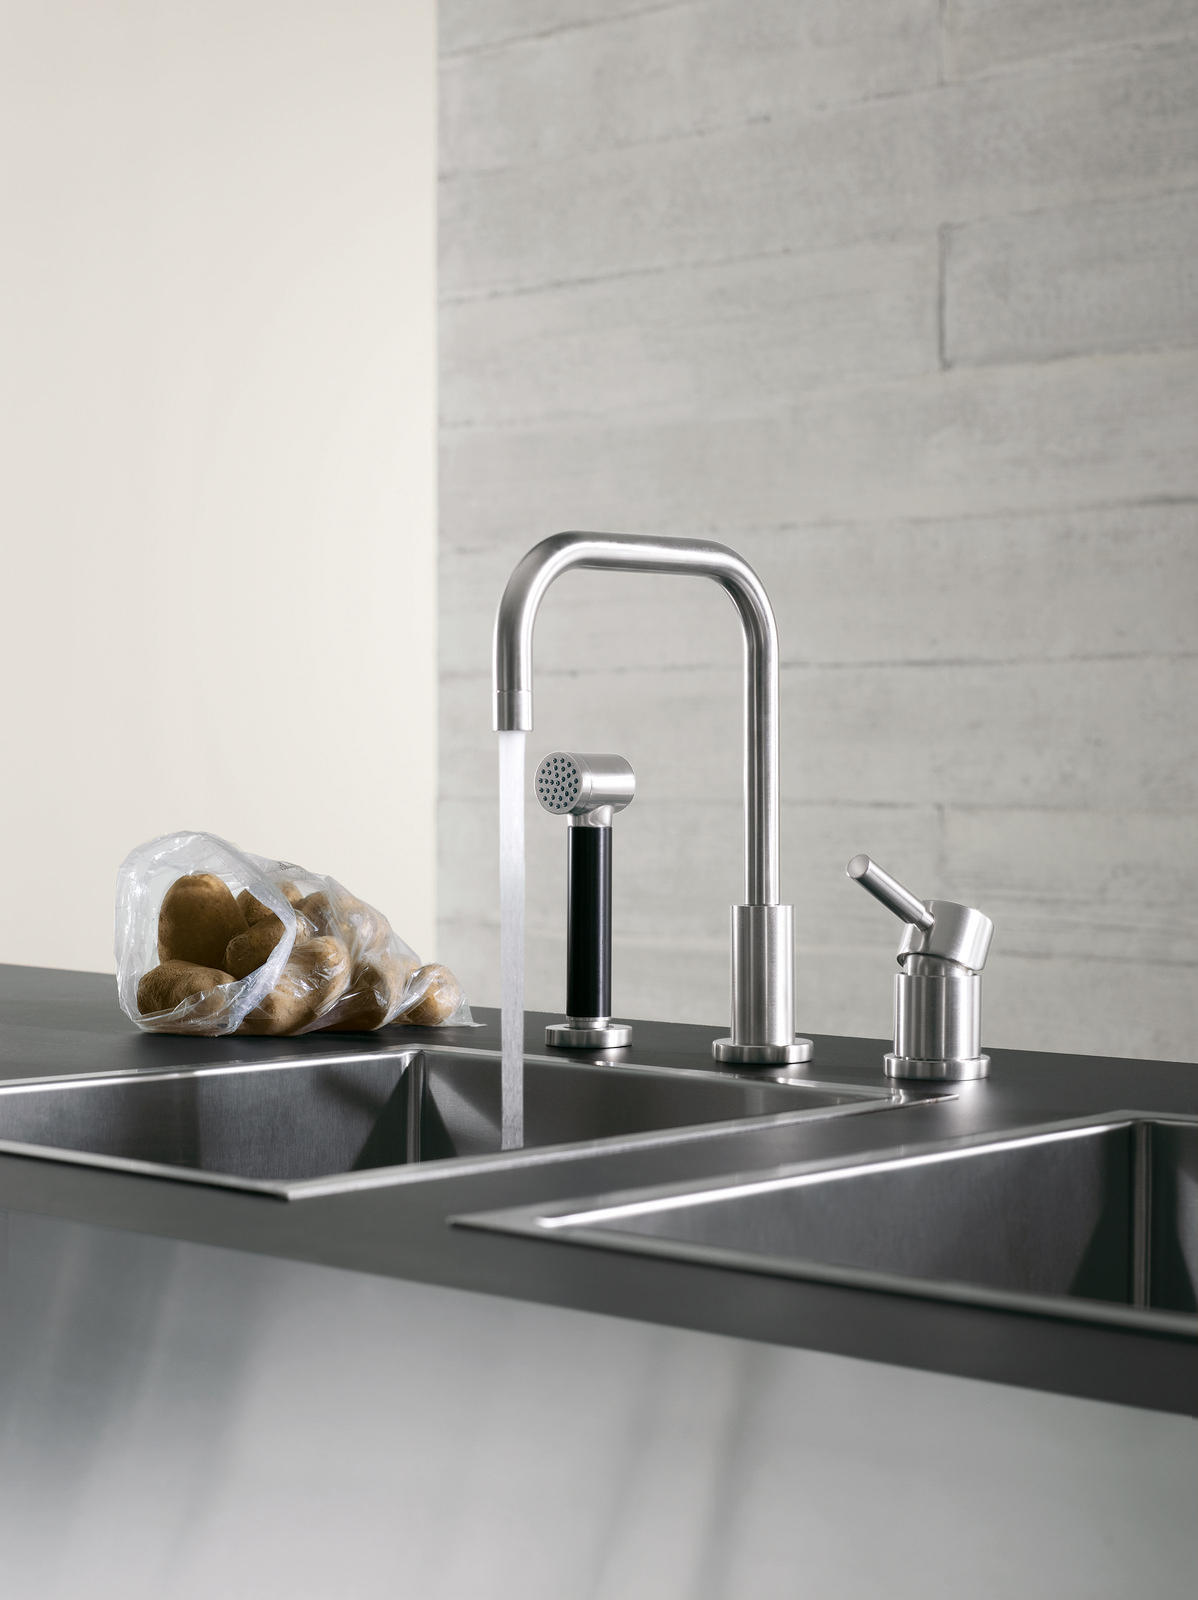 Dornbract | Dornbracht Hand Shower | Dornbracht Kitchen Faucet